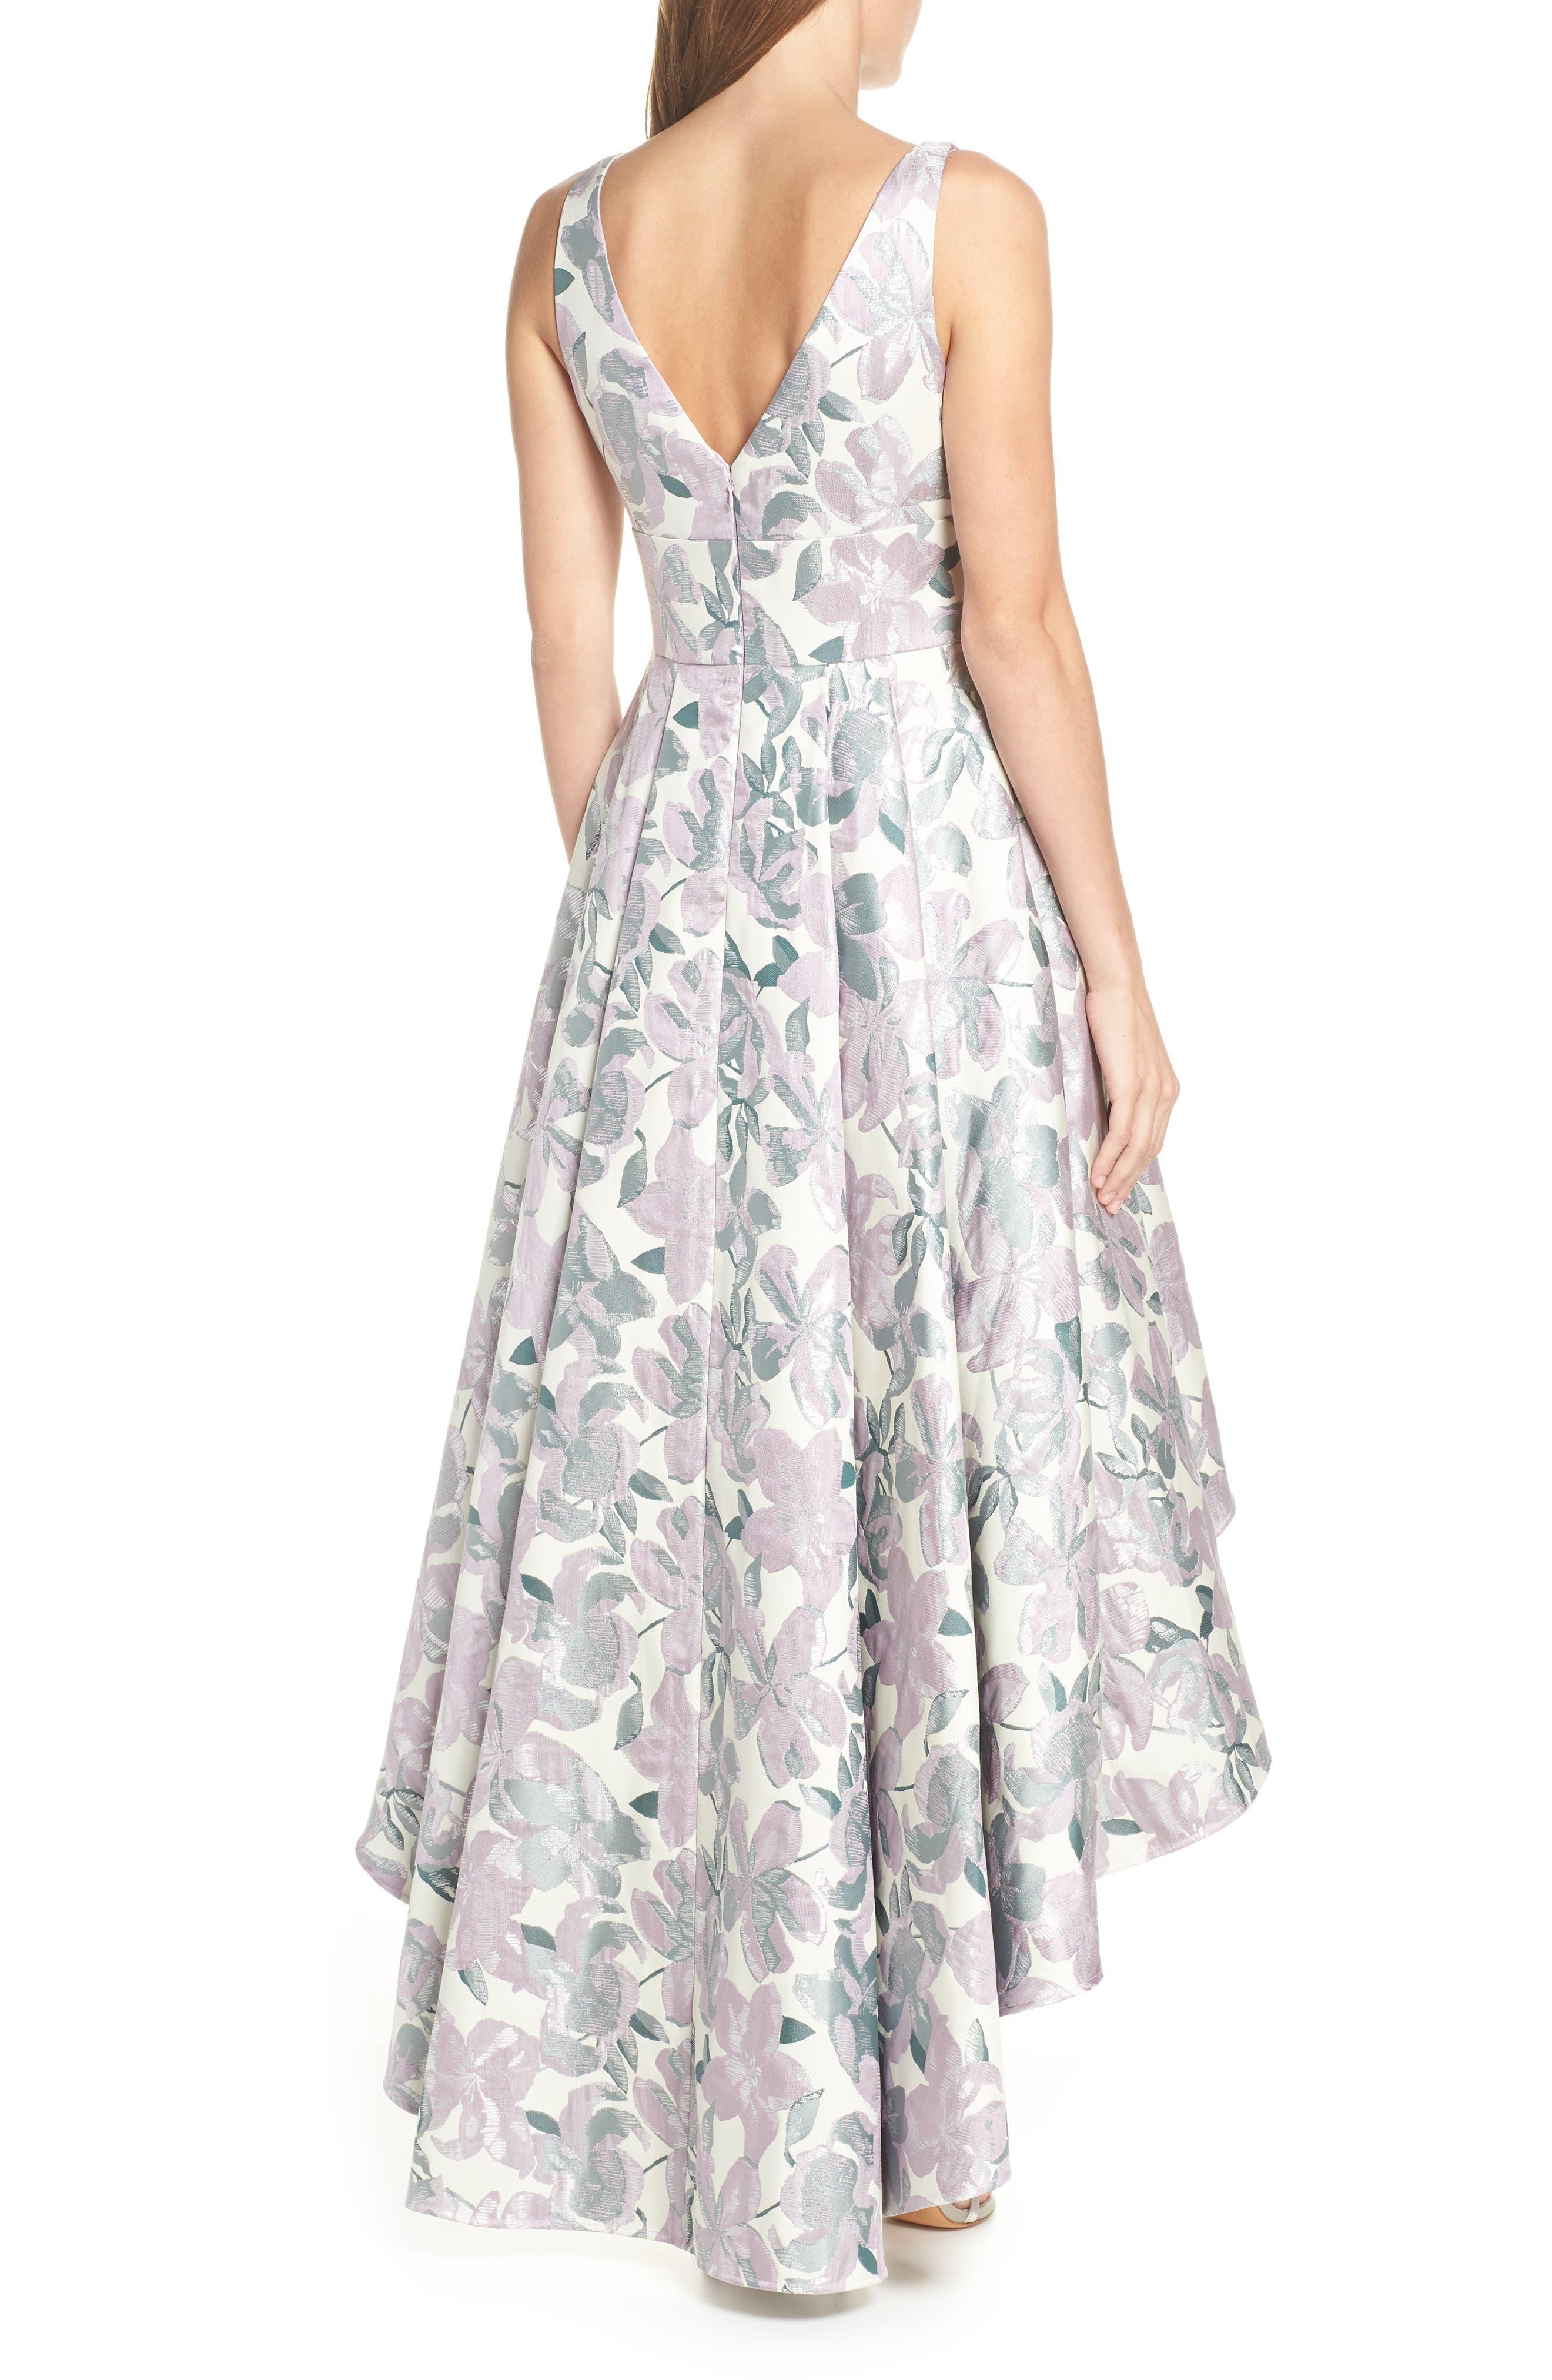 ELIZA J, Floral Jacquard High/Low Evening Dress, Alternate thumbnail 2, color, LILAC COMBINATION